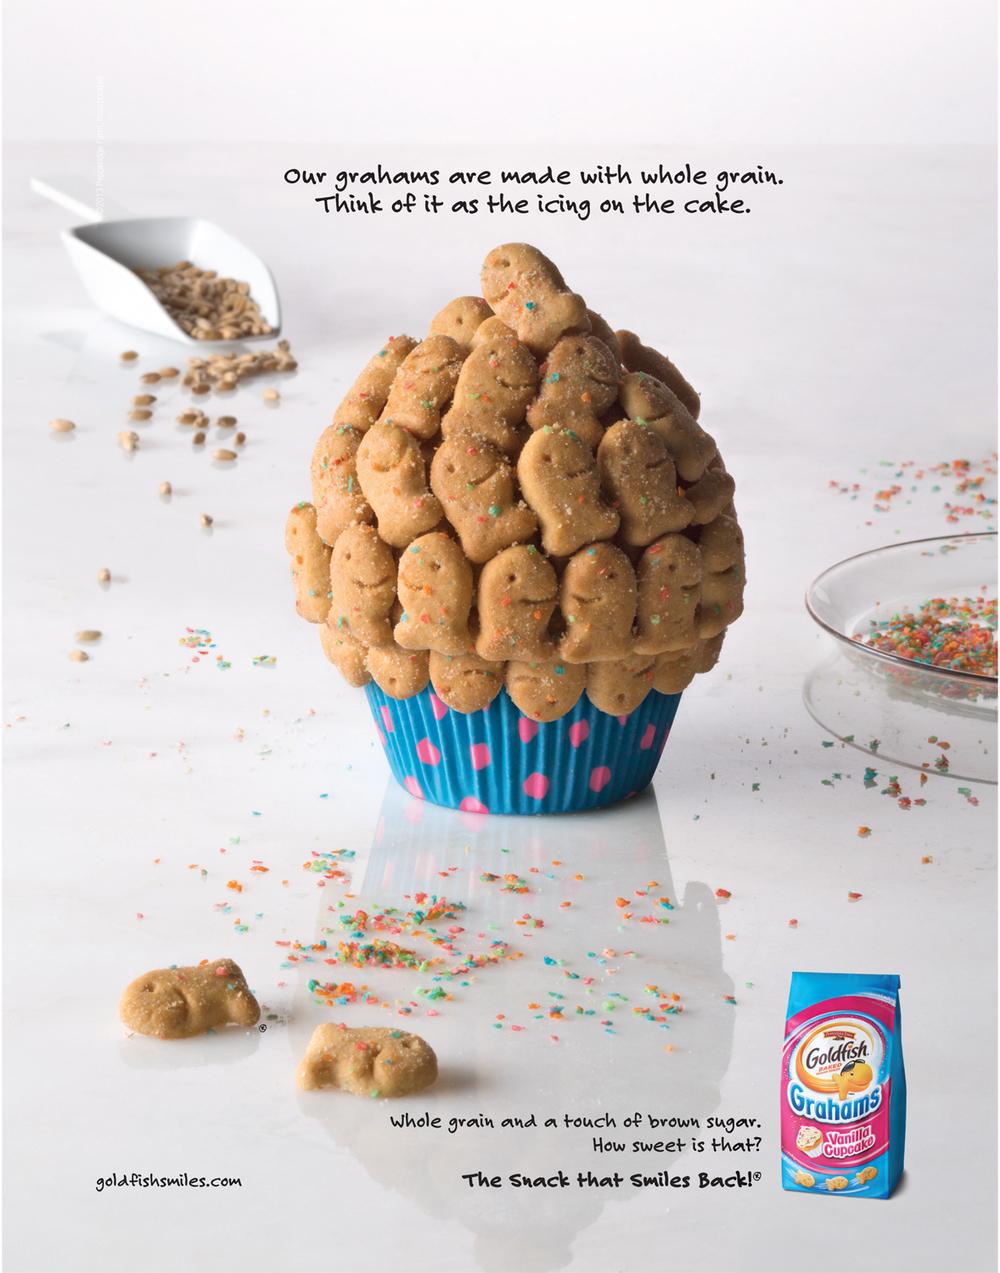 pepp_Graham_cupcake.jpg